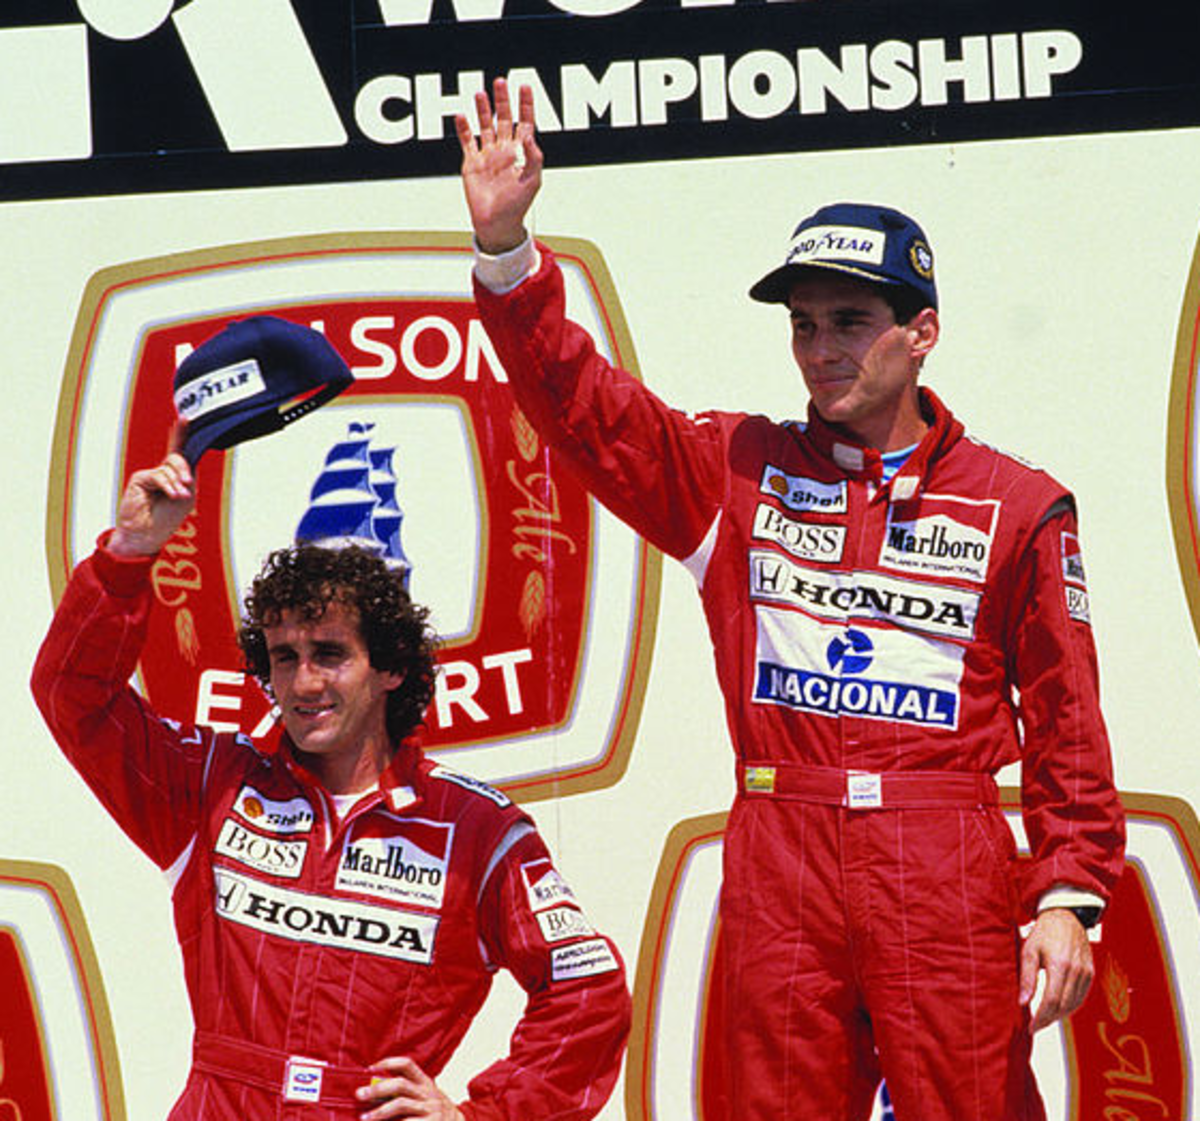 Both drivers on the podium